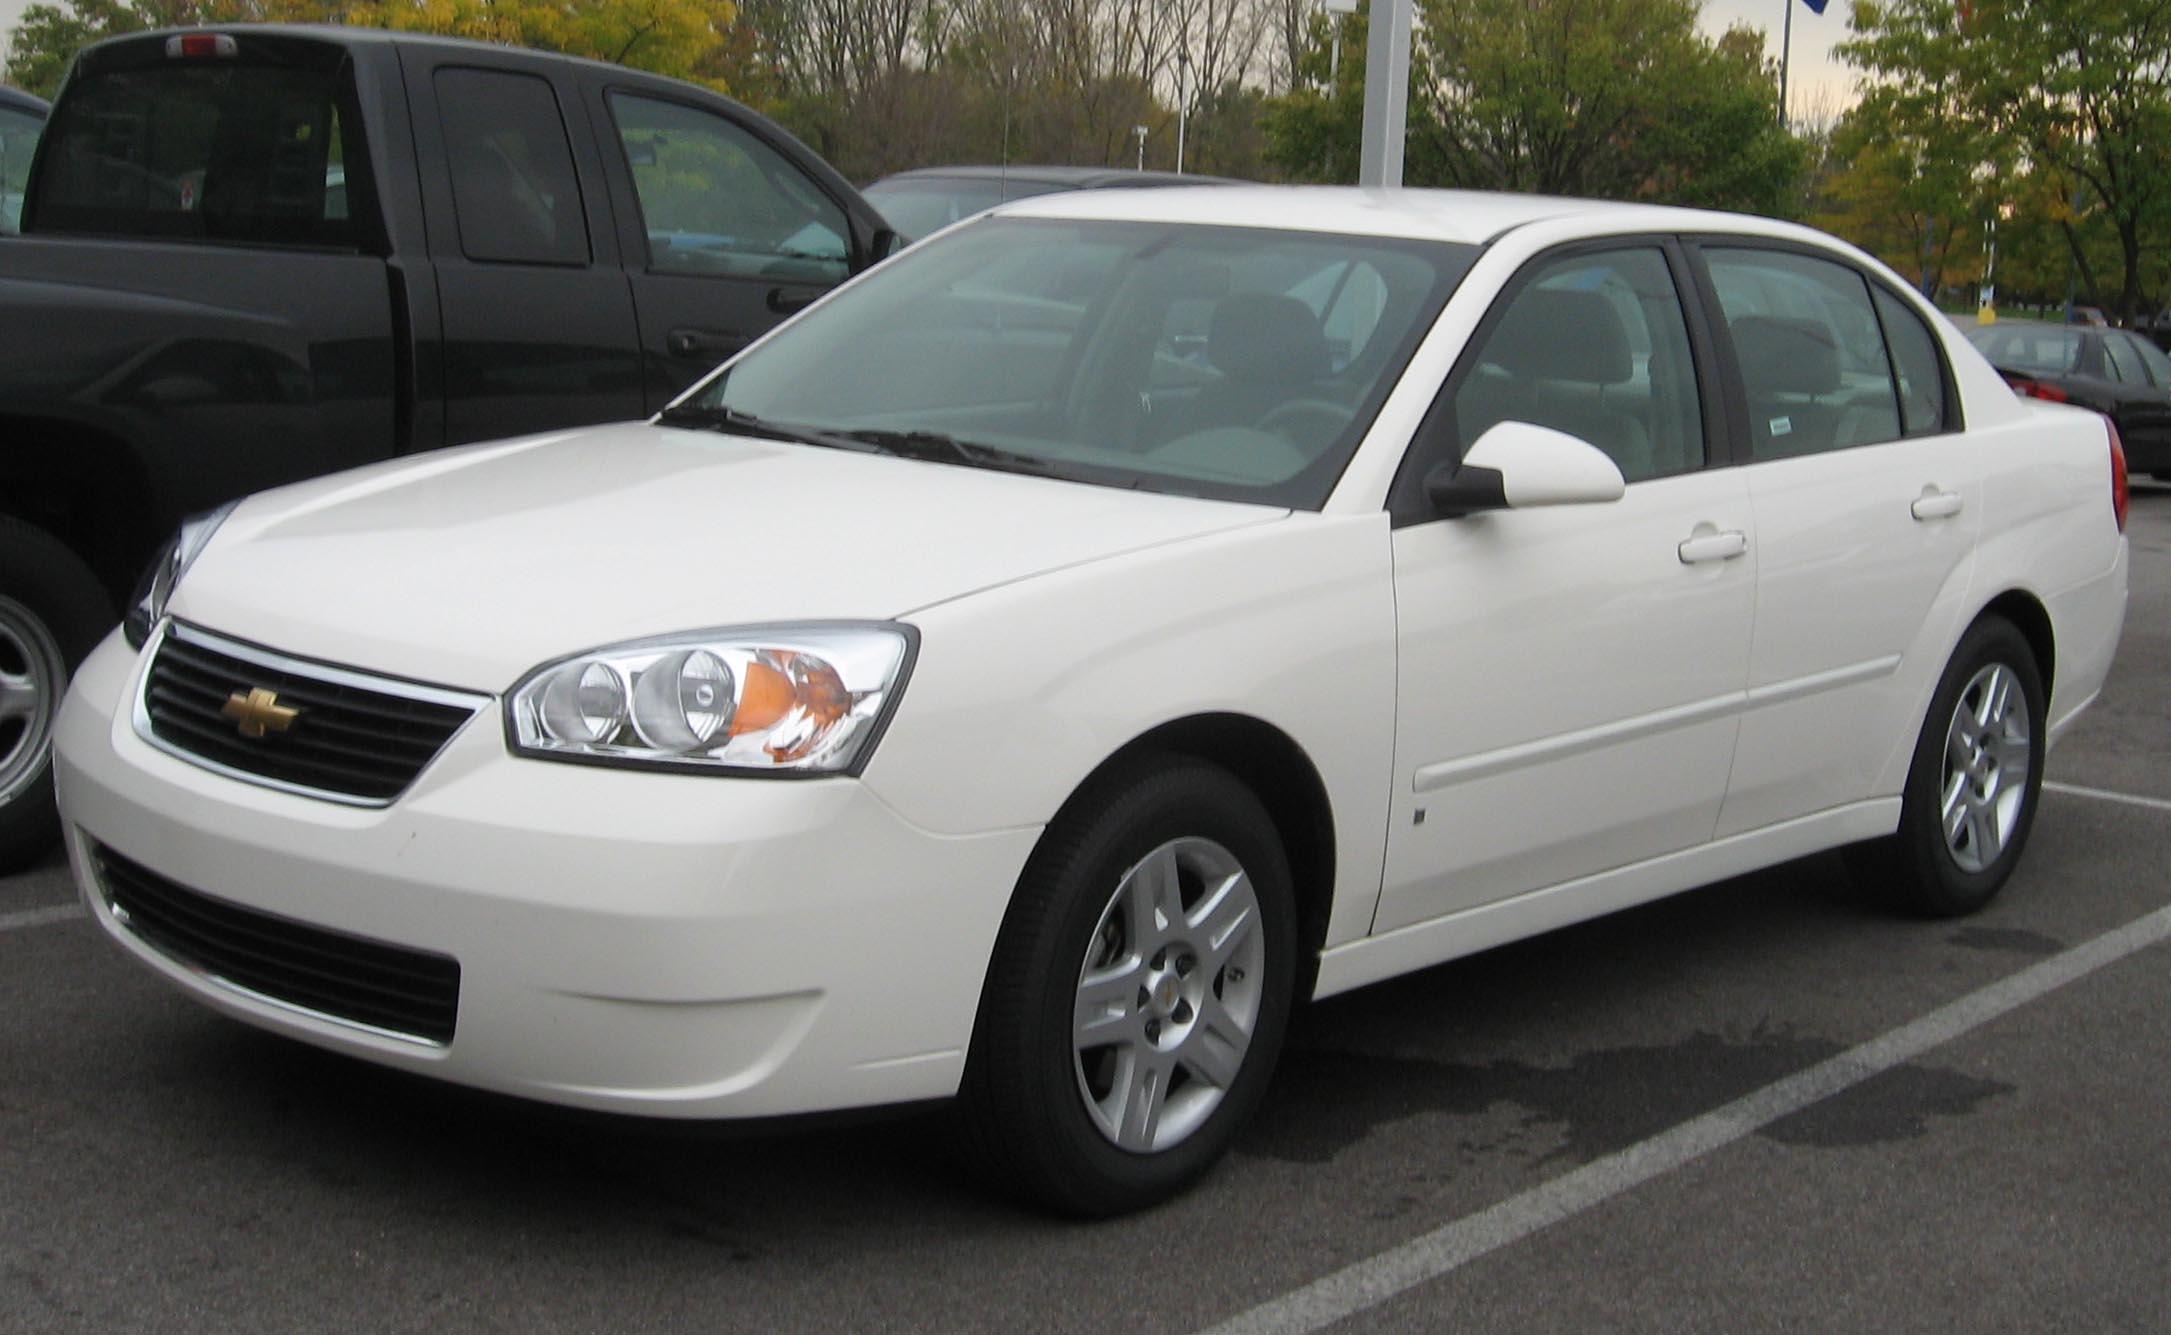 2007 Chevy Malibu